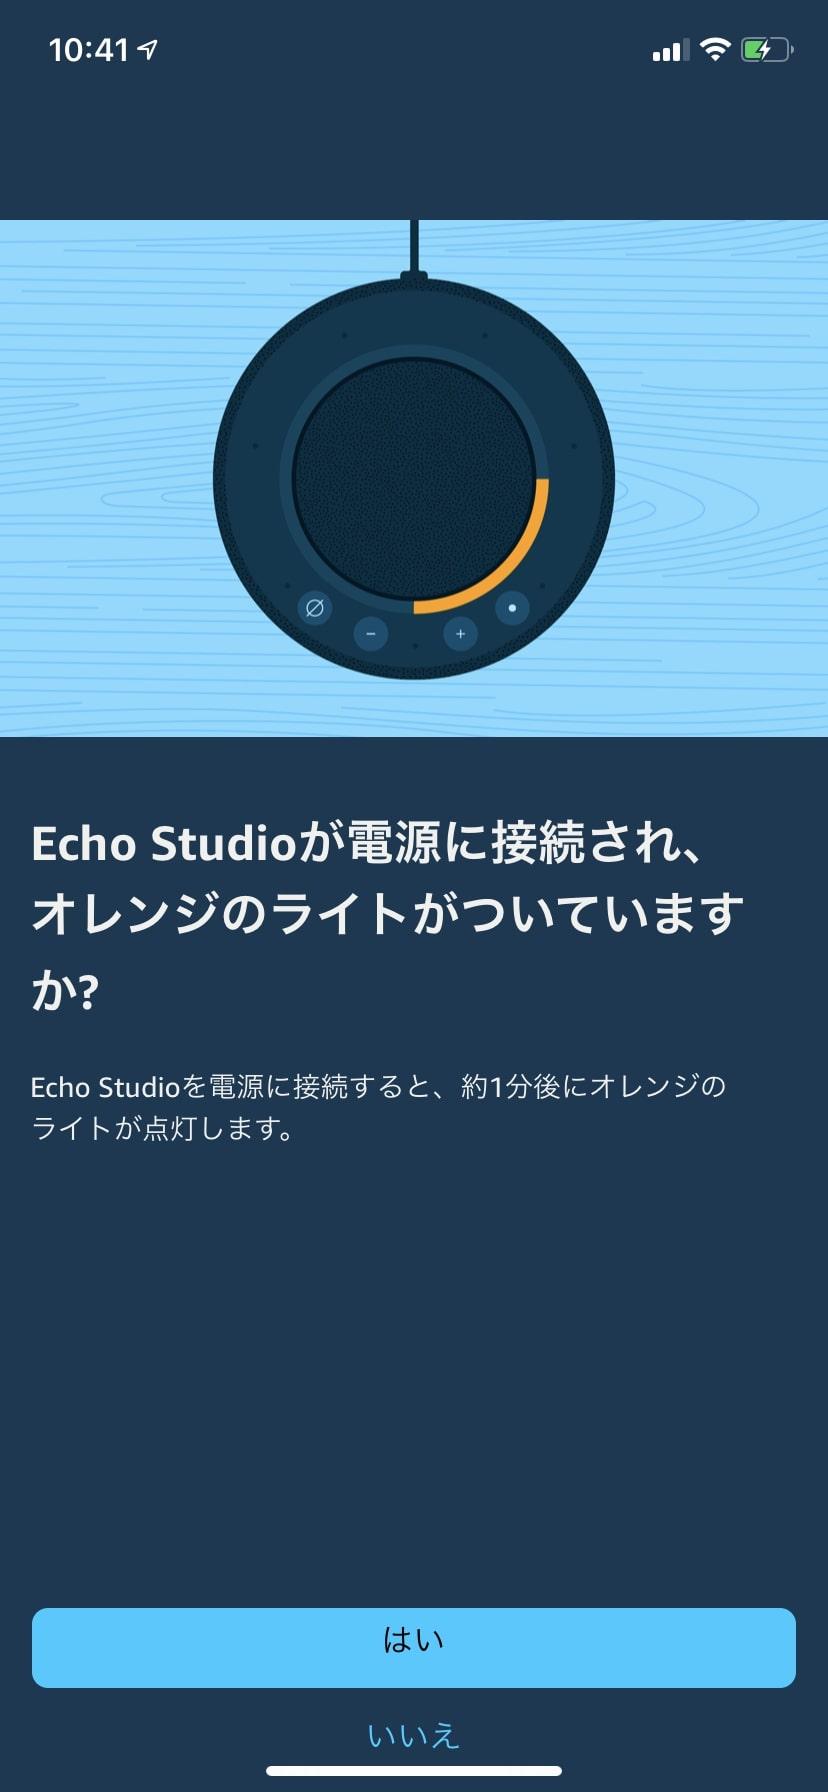 Amazon Echo Studioの初期設定の手順を写真付で解説!おすすめの音楽アプリは?